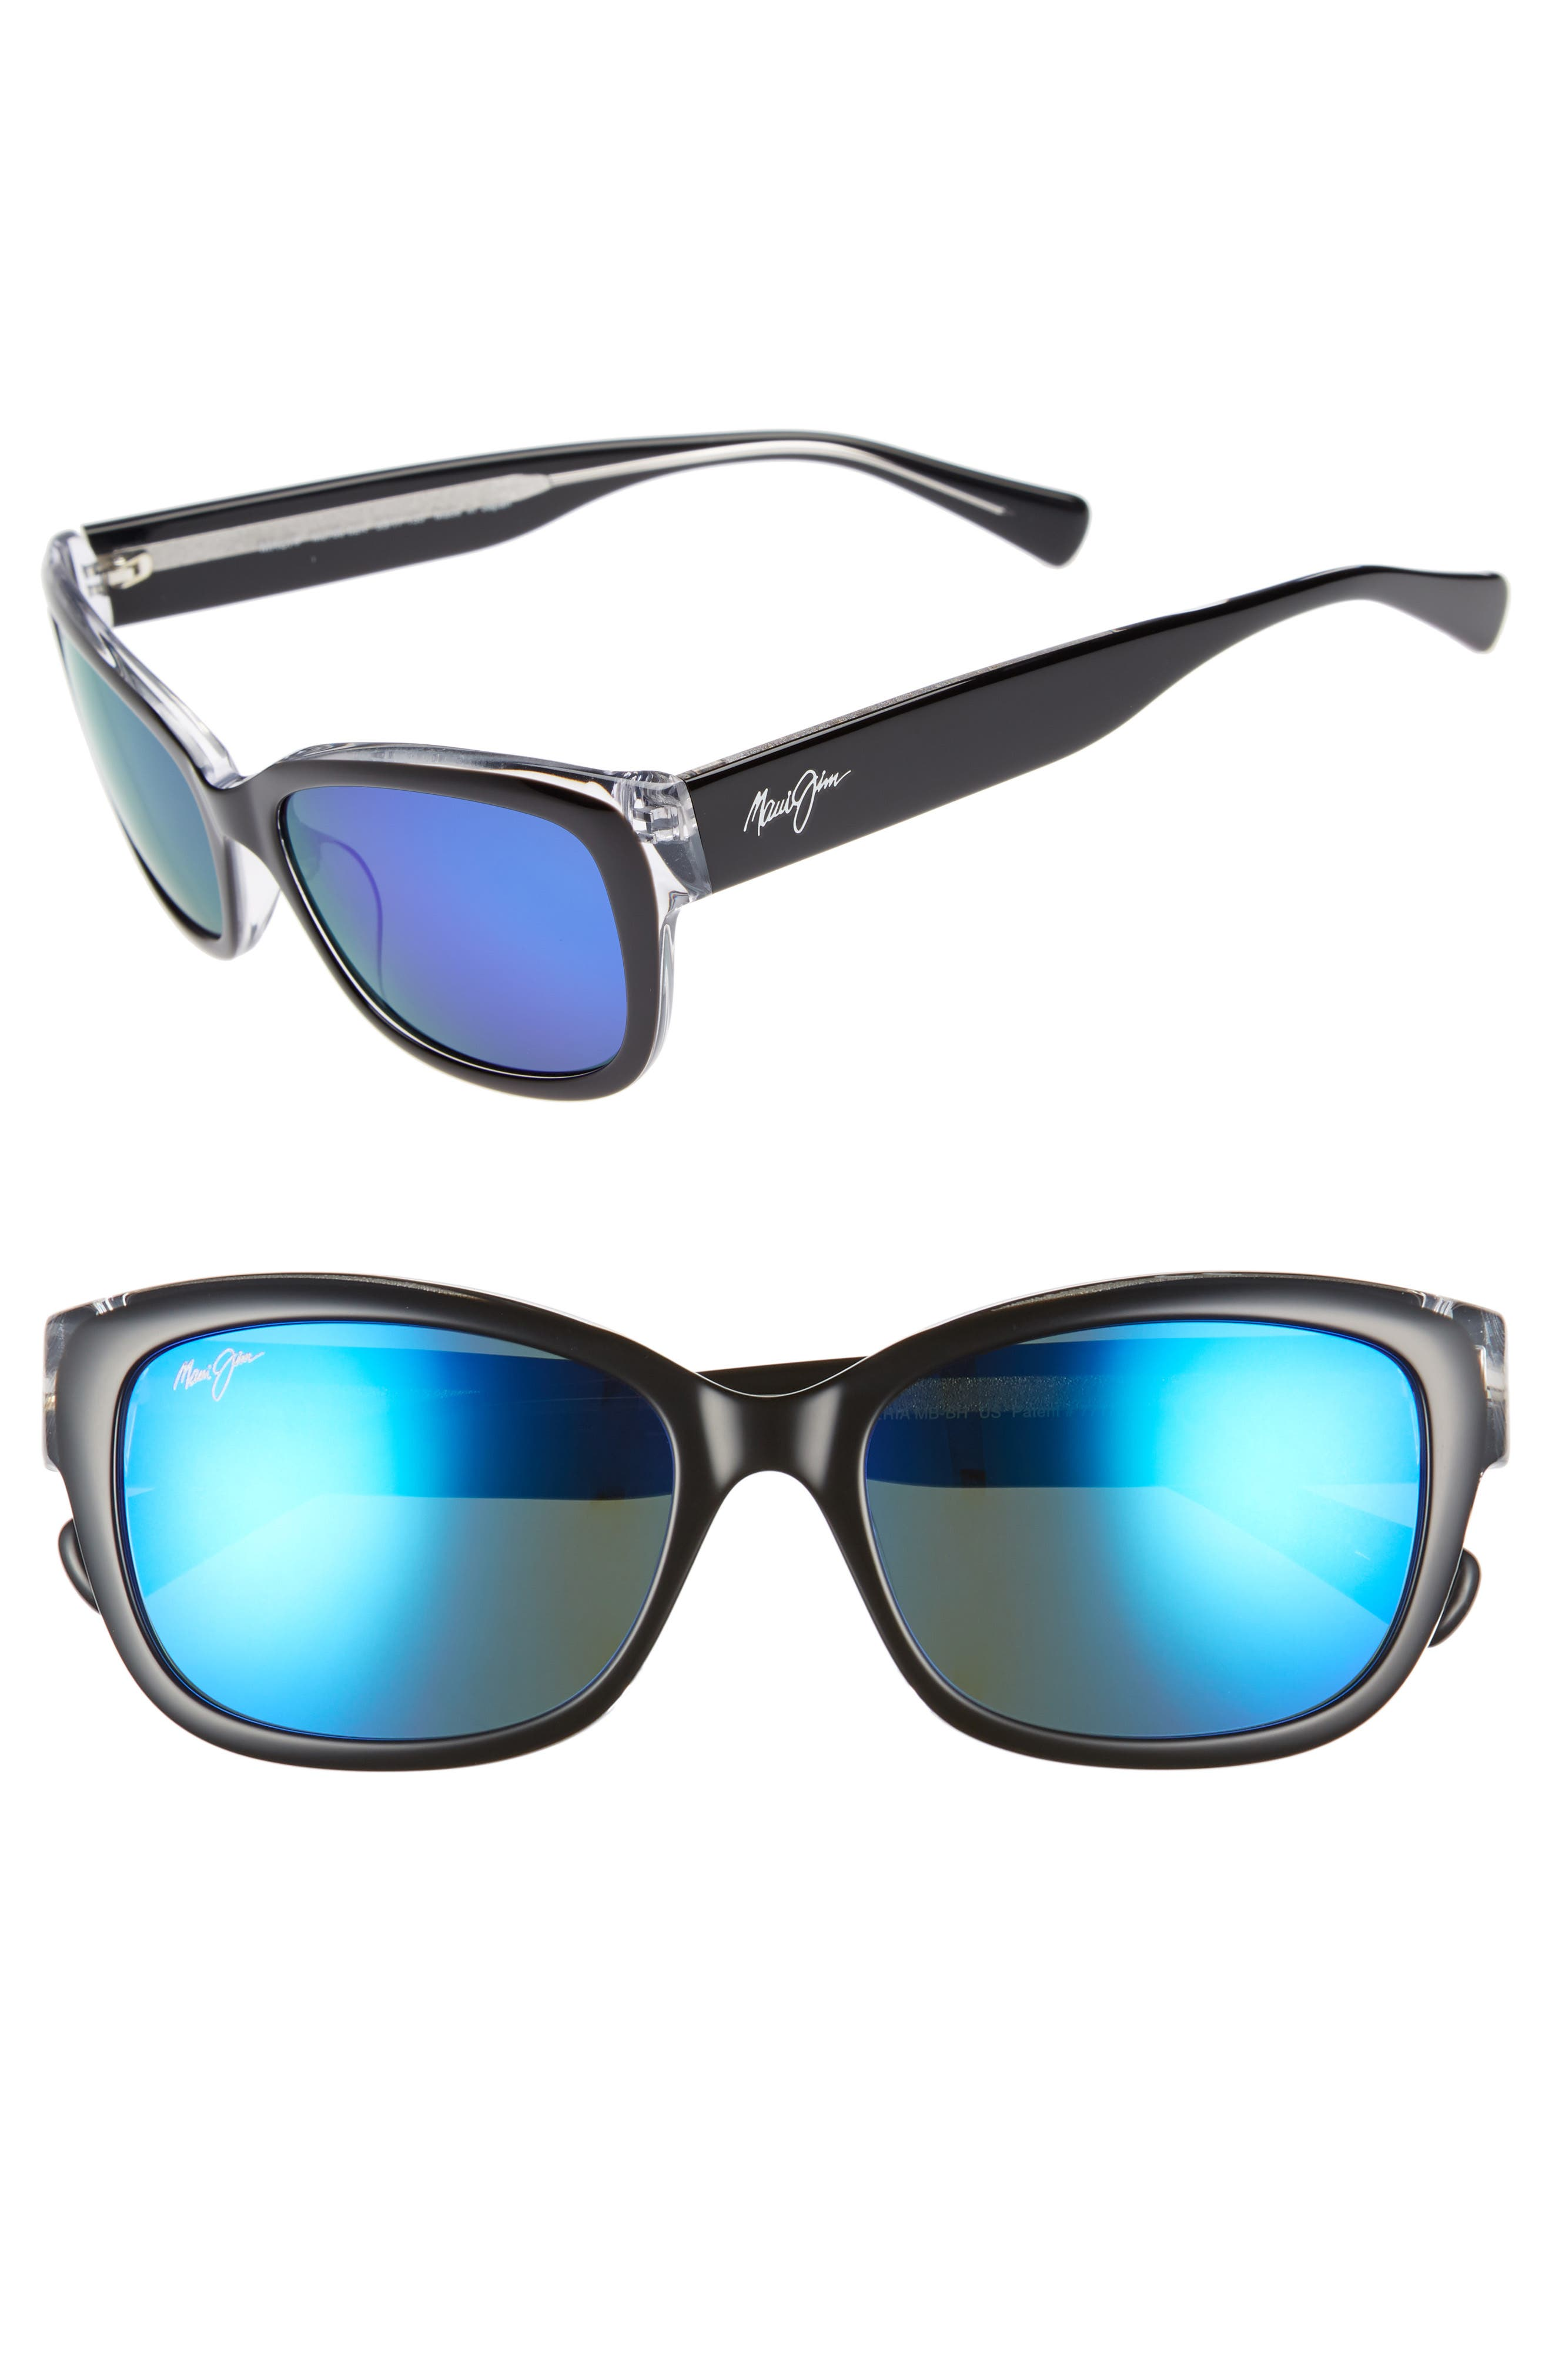 Plumeria 55mm Polarized Cat Eye Sunglasses,                             Main thumbnail 1, color,                             BLACK W CRYSTAL/ BLUE HAWAII